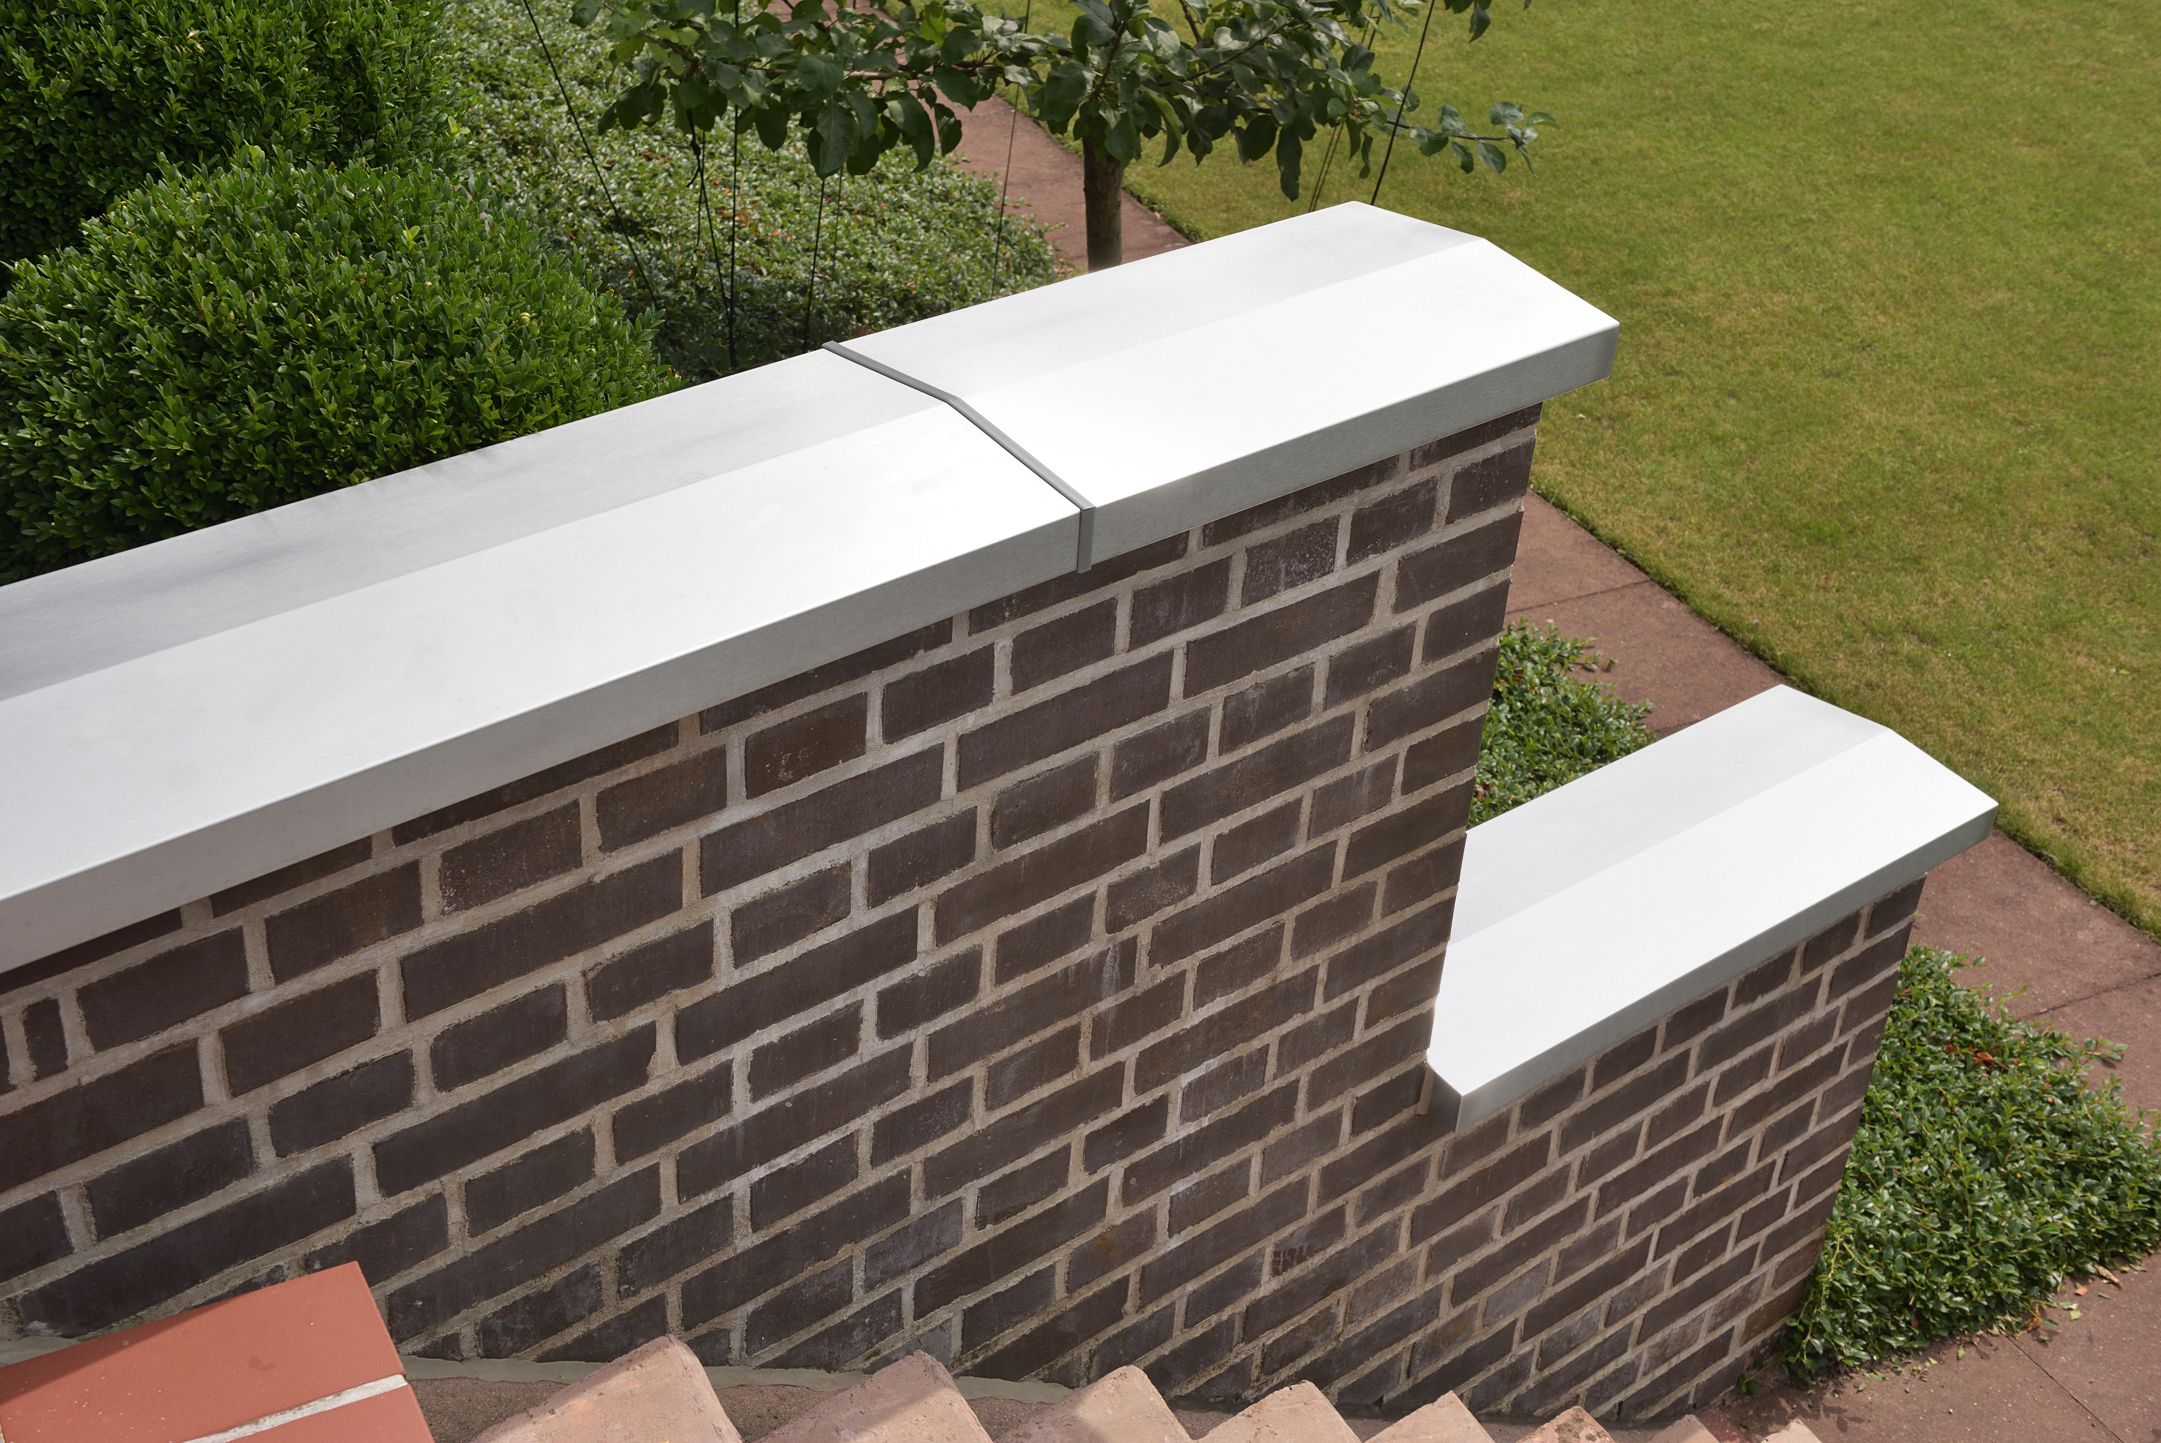 mauerabdeckung beton preis. Black Bedroom Furniture Sets. Home Design Ideas